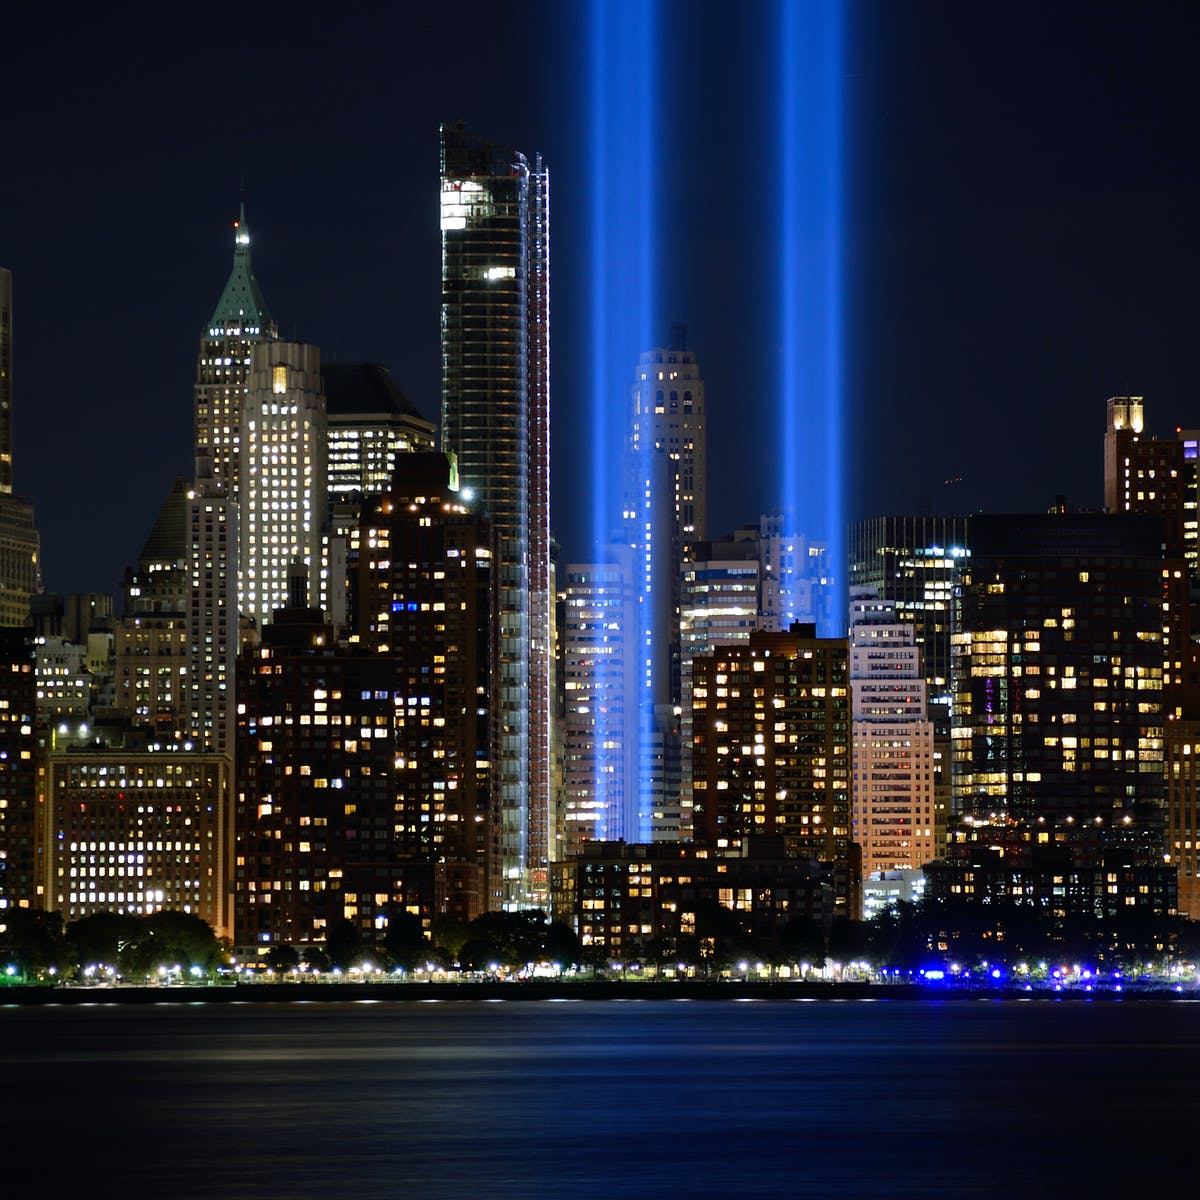 9/11, Terrorism, War on Terror